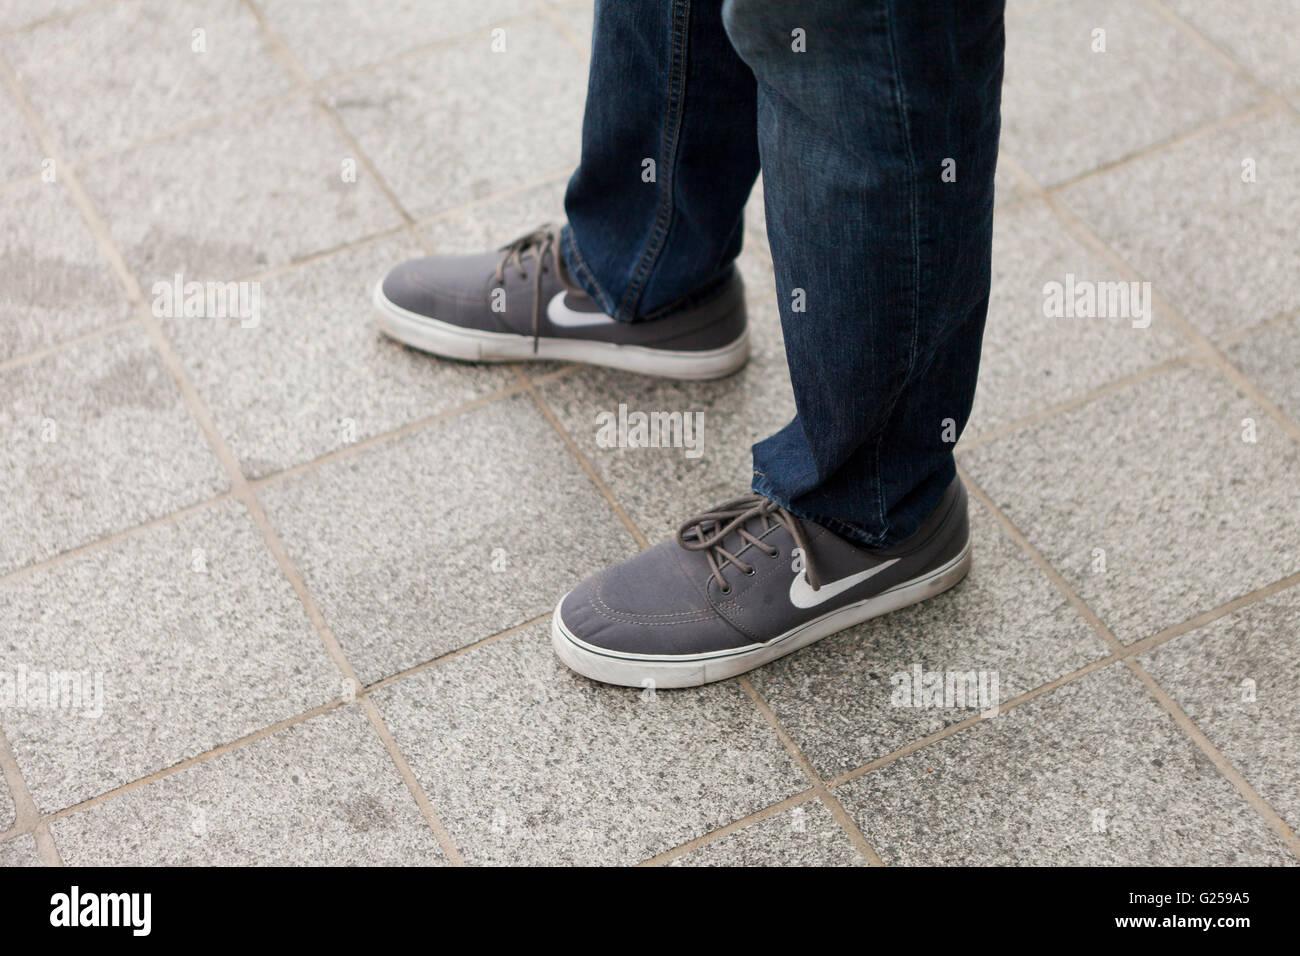 Homme portant des chaussures de toile Nike - USA Photo Stock - Alamy